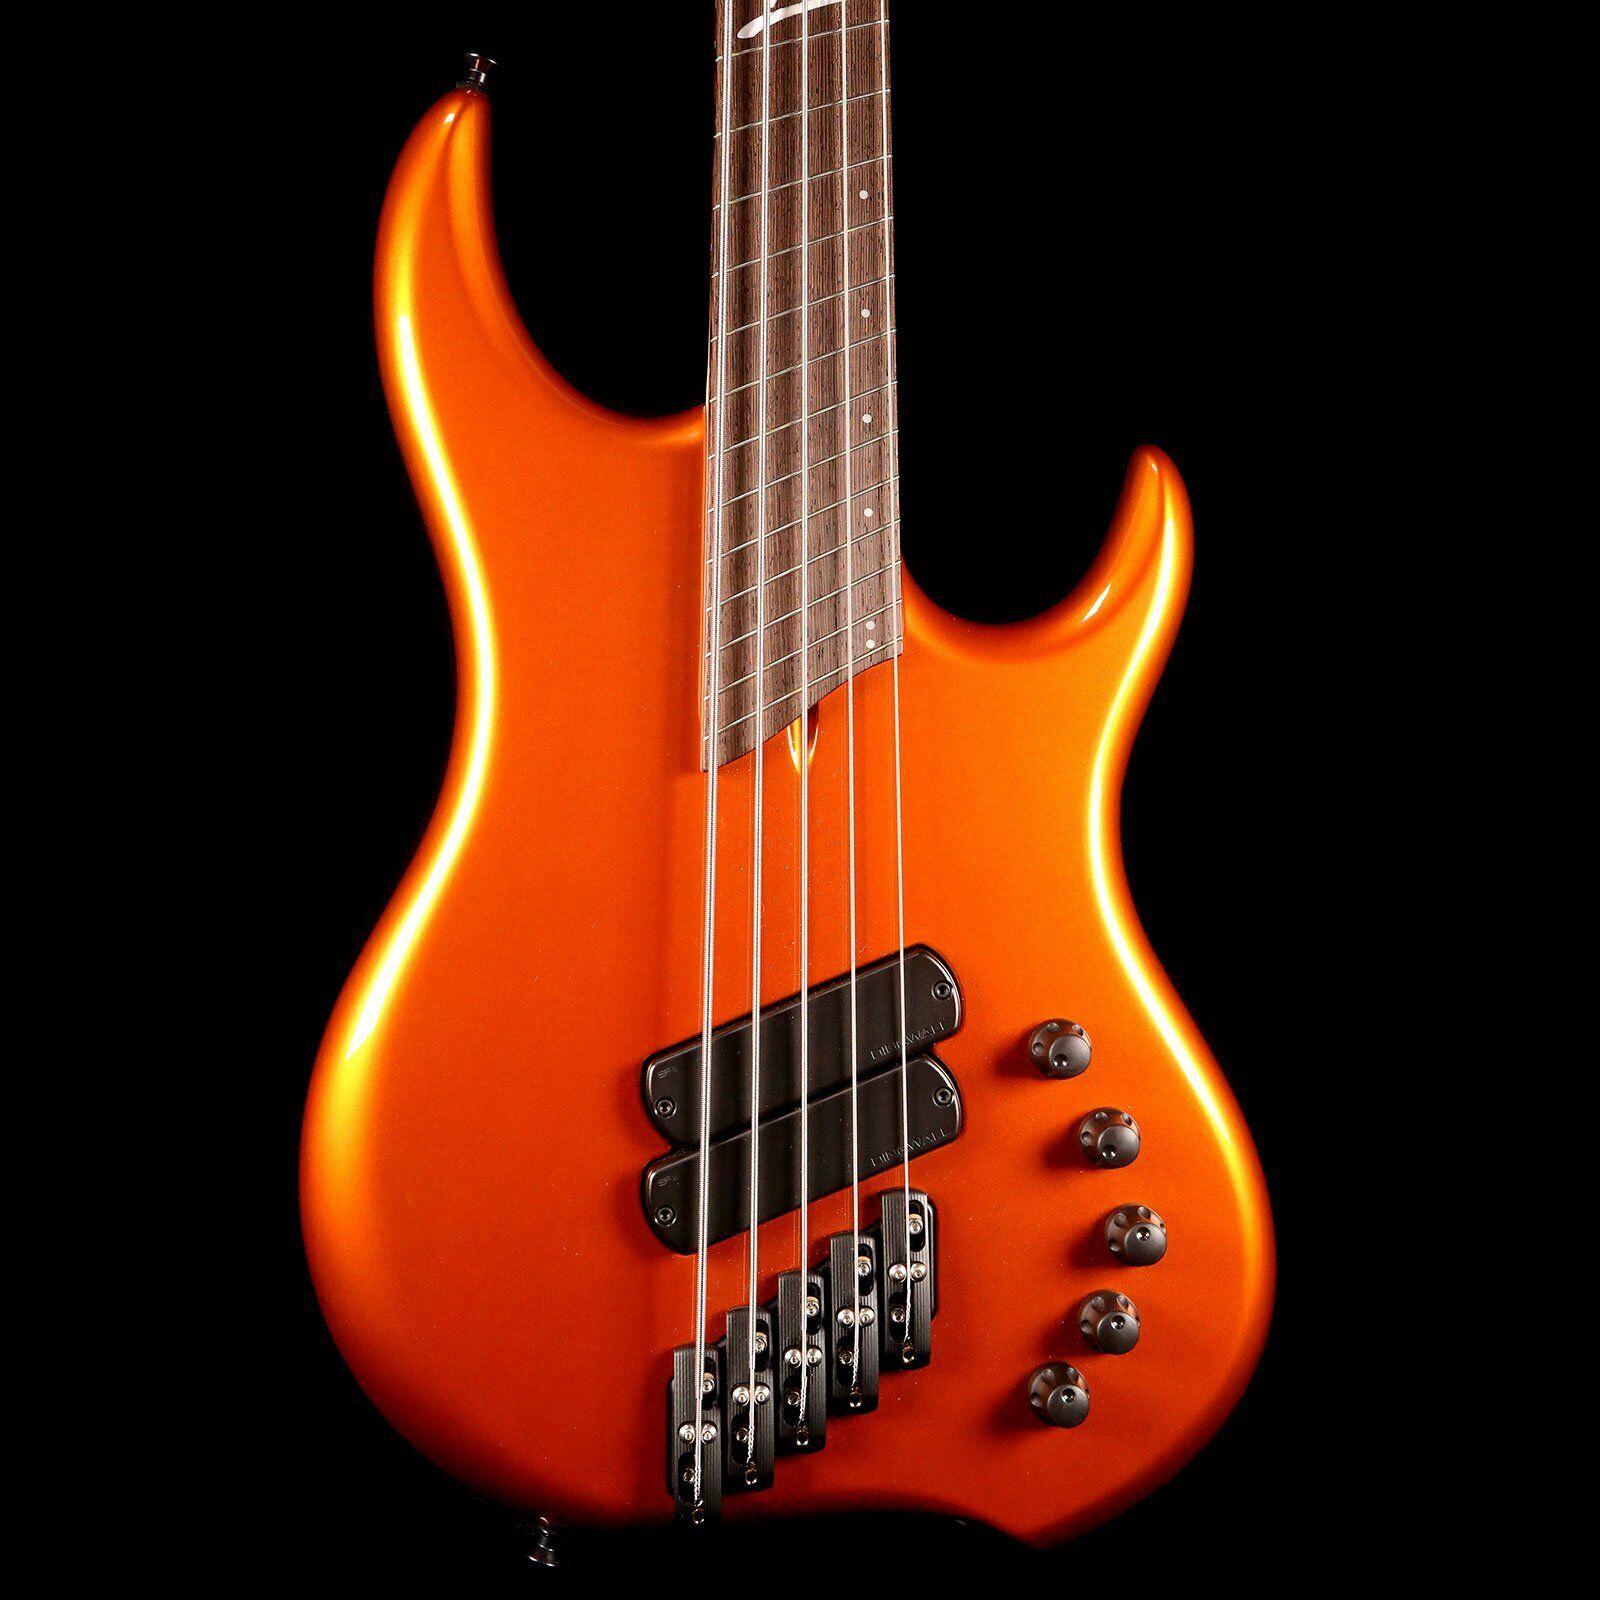 Dingwall Lee Sklar Signature Bass Candy Tangerine